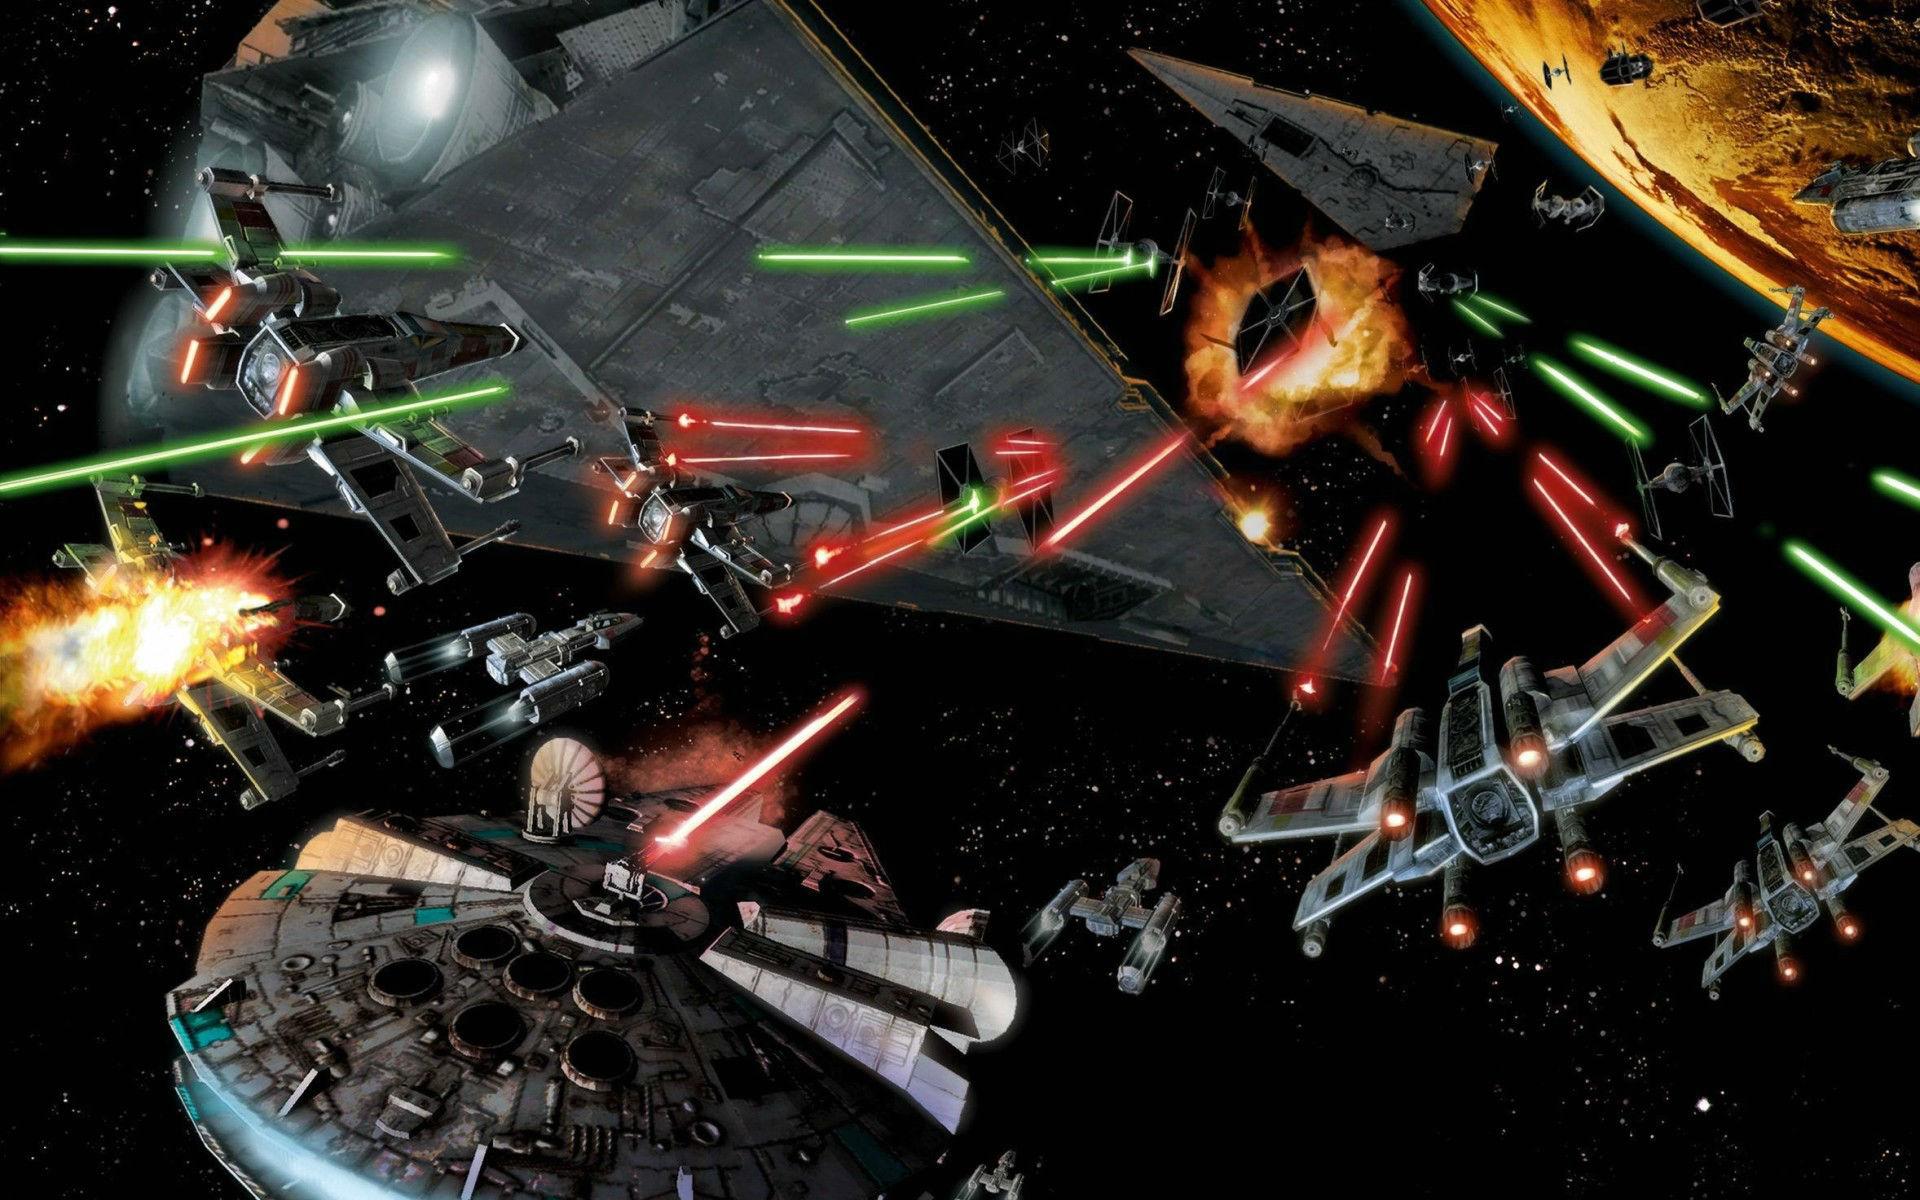 The Hunter Wars Star Wars Delta Squad Wiki FANDOM powered by Wikia 1920x1200